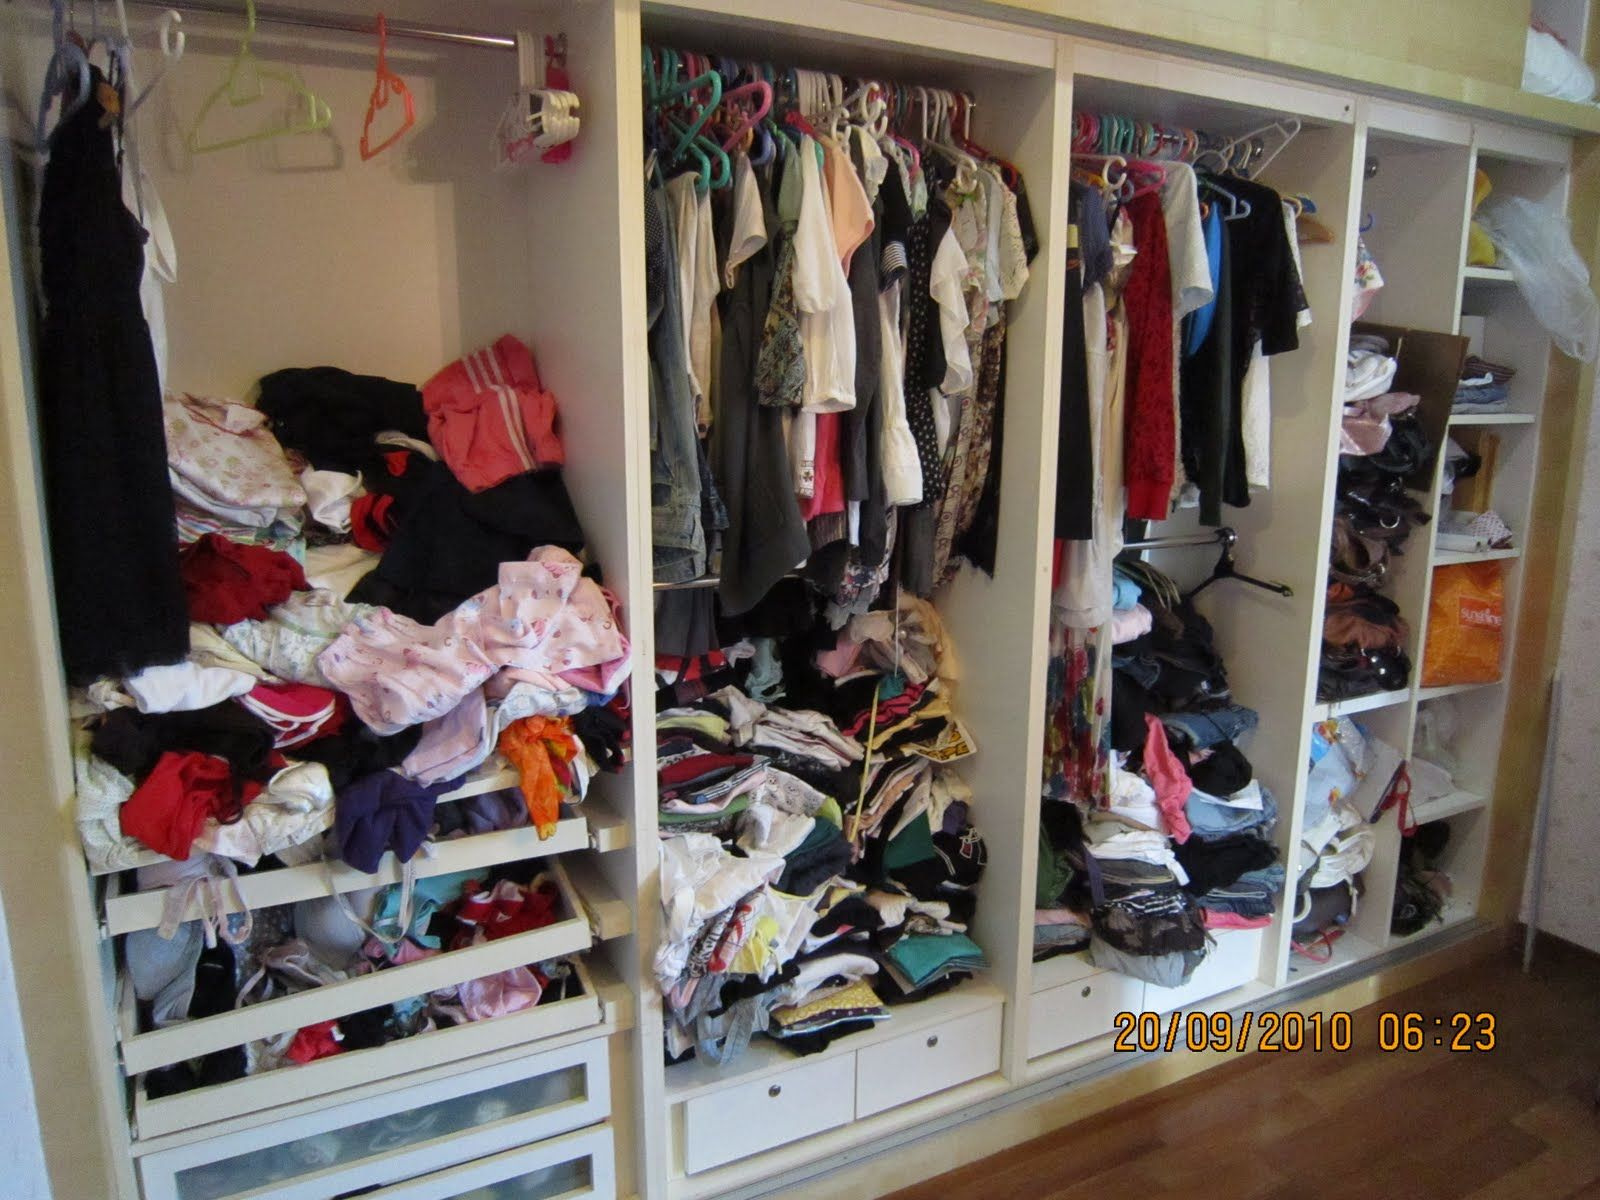 walk in wardrobe messy Google Search